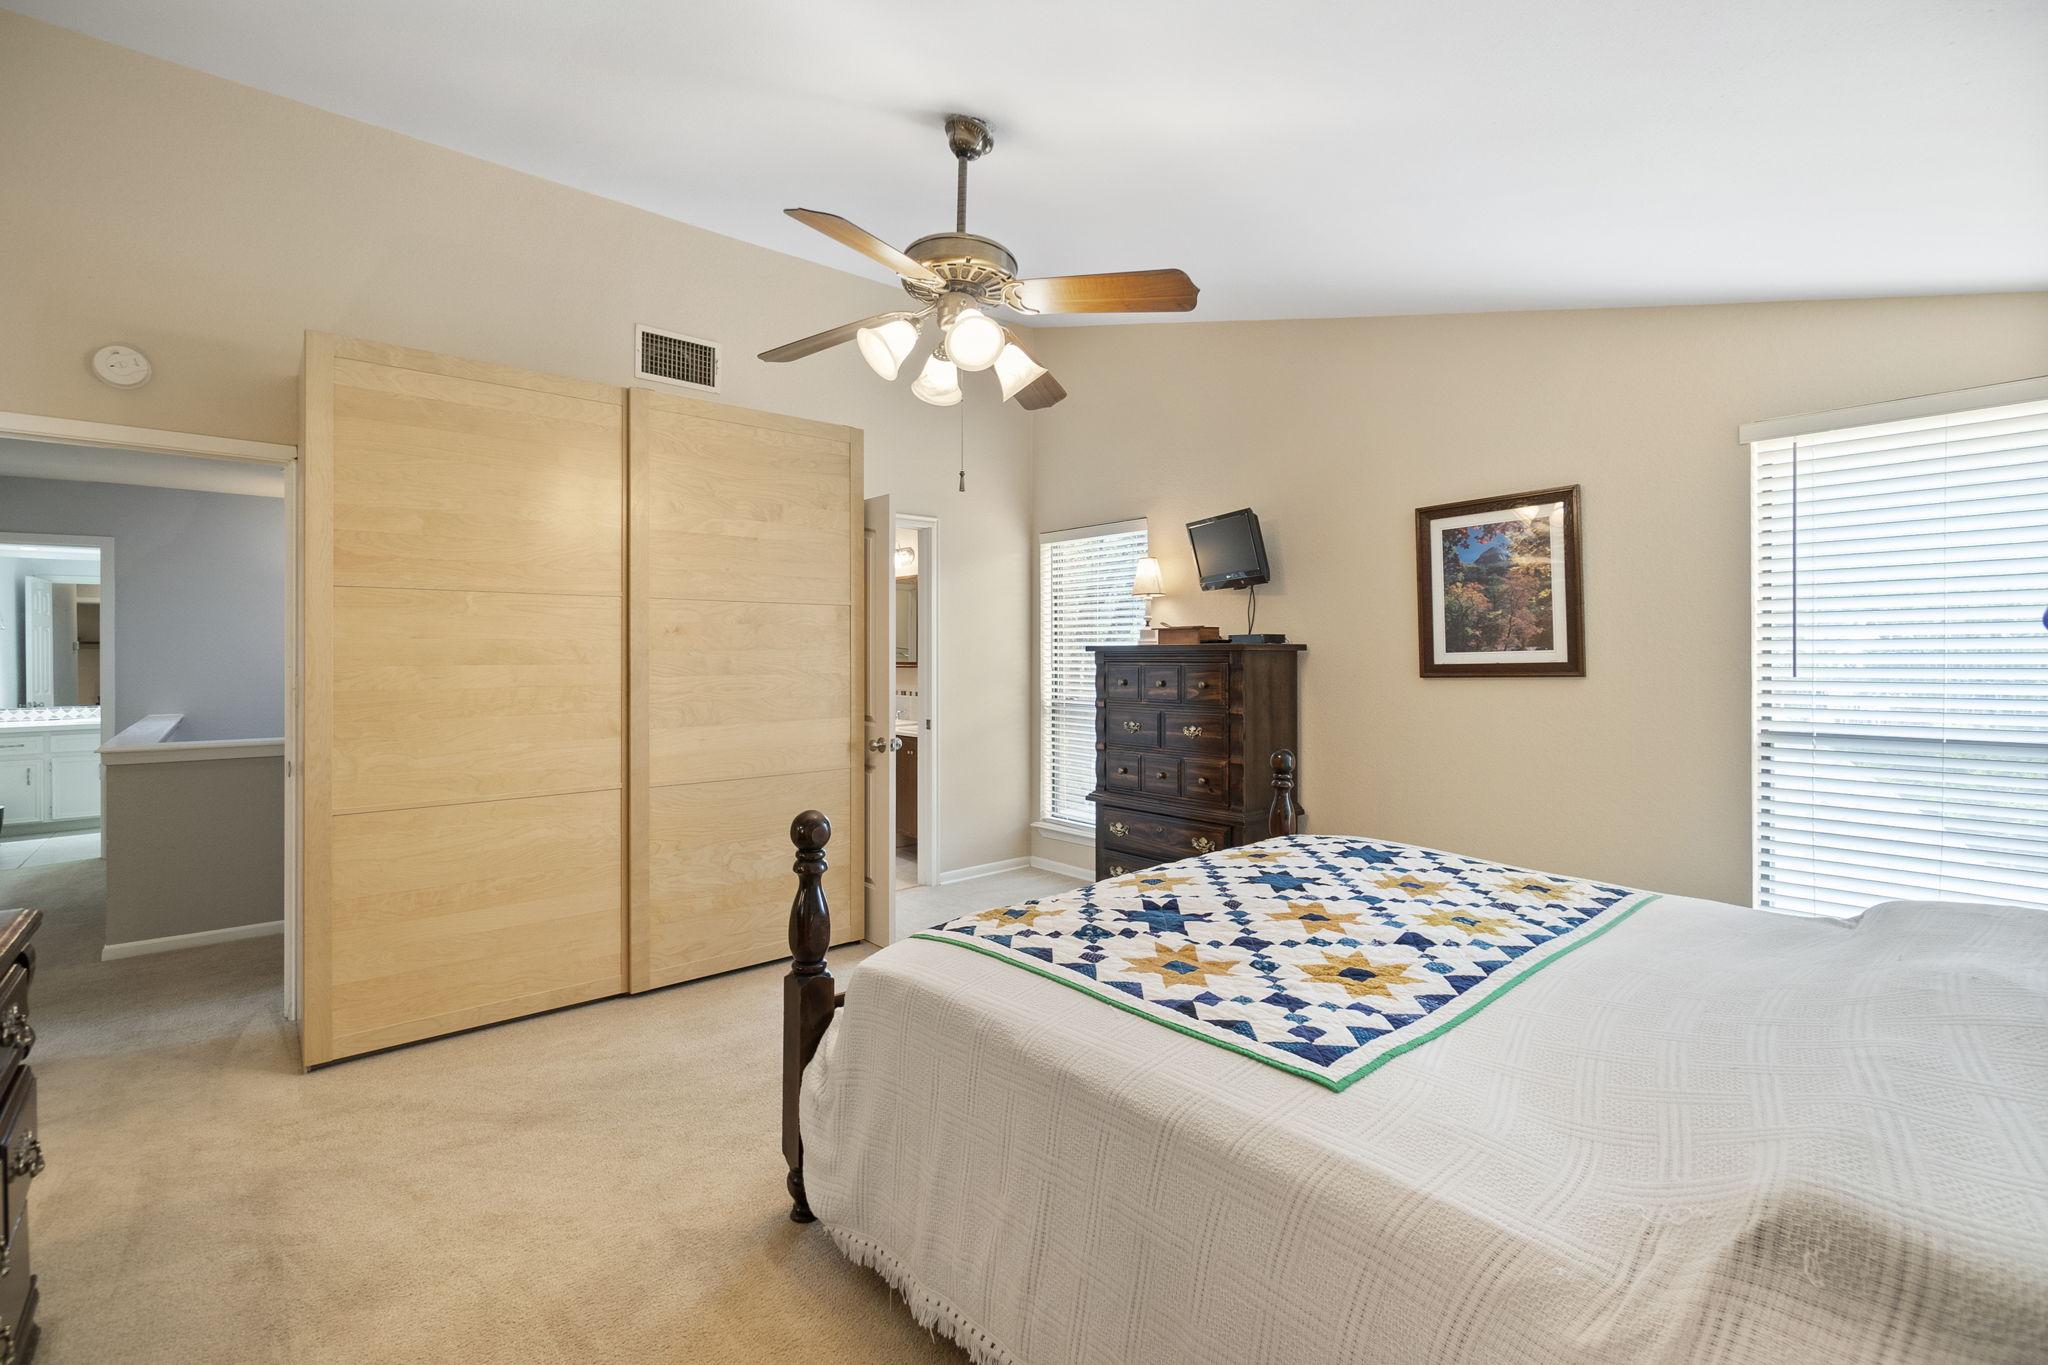 Main bedroom with ensuite bath